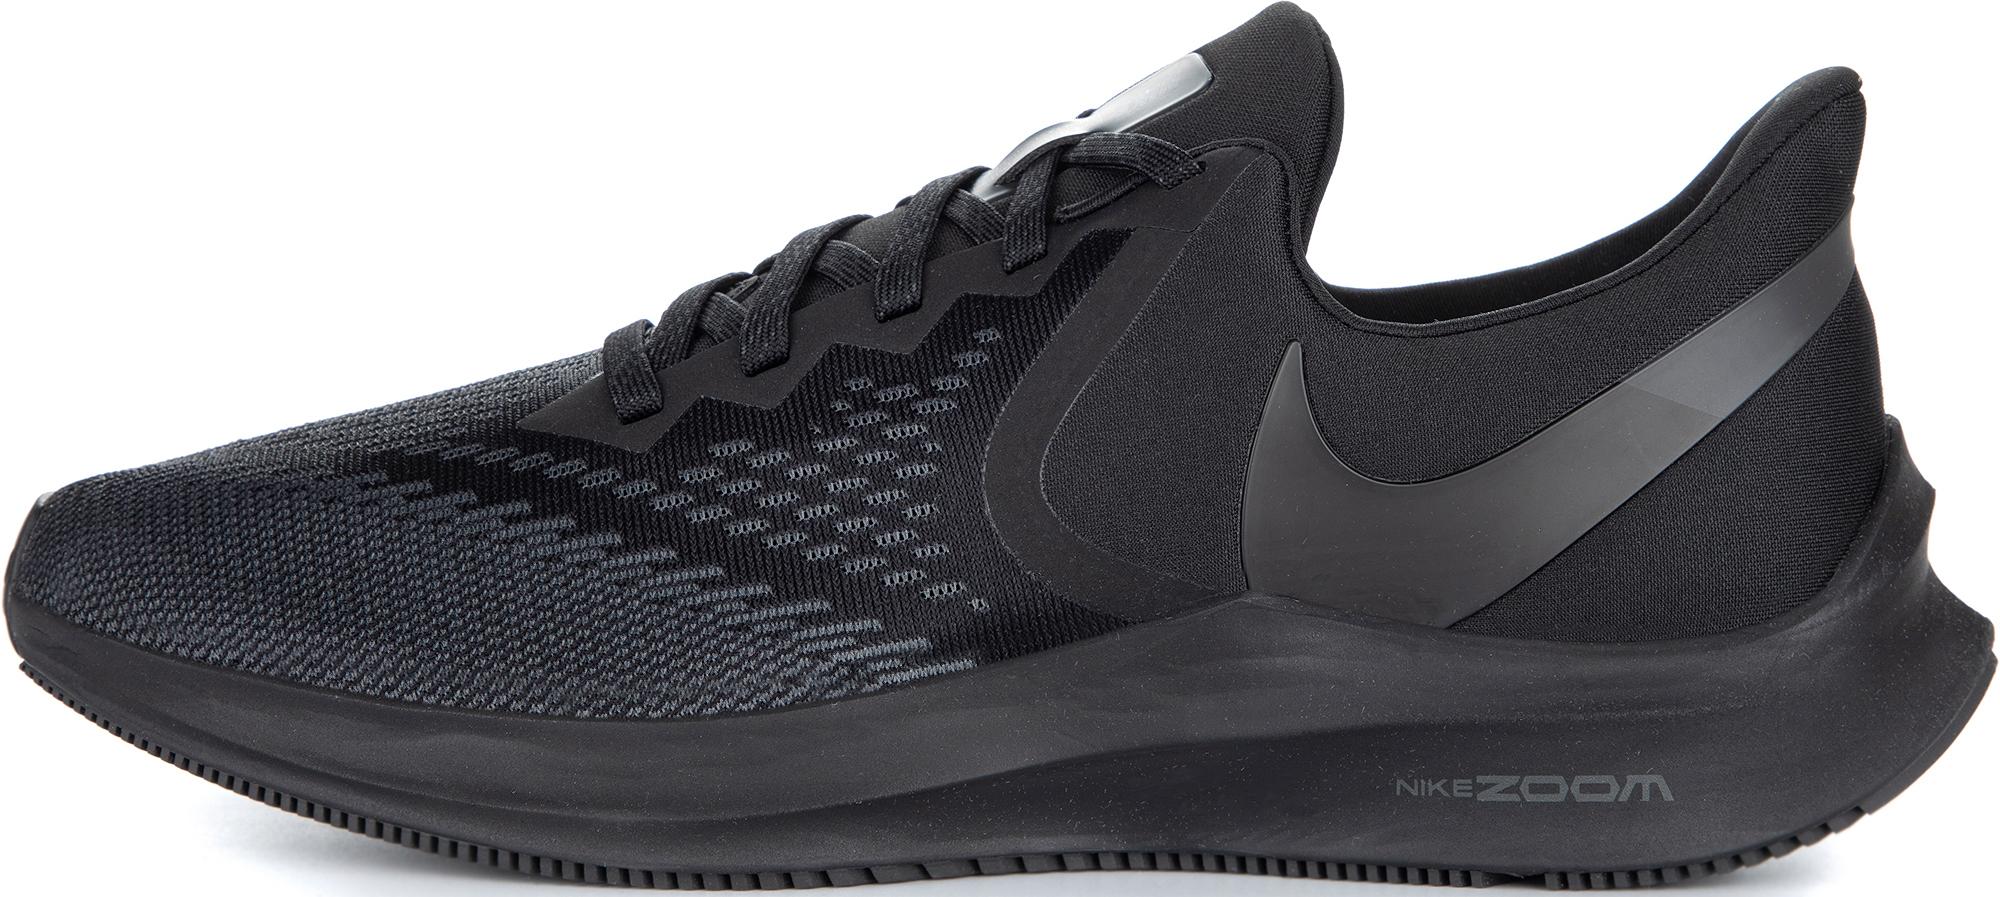 Nike Кроссовки мужские Nike Zoom Winflo 6, размер 43.5 nike кроссовки мужские nike air zoom vapor x clay размер 45